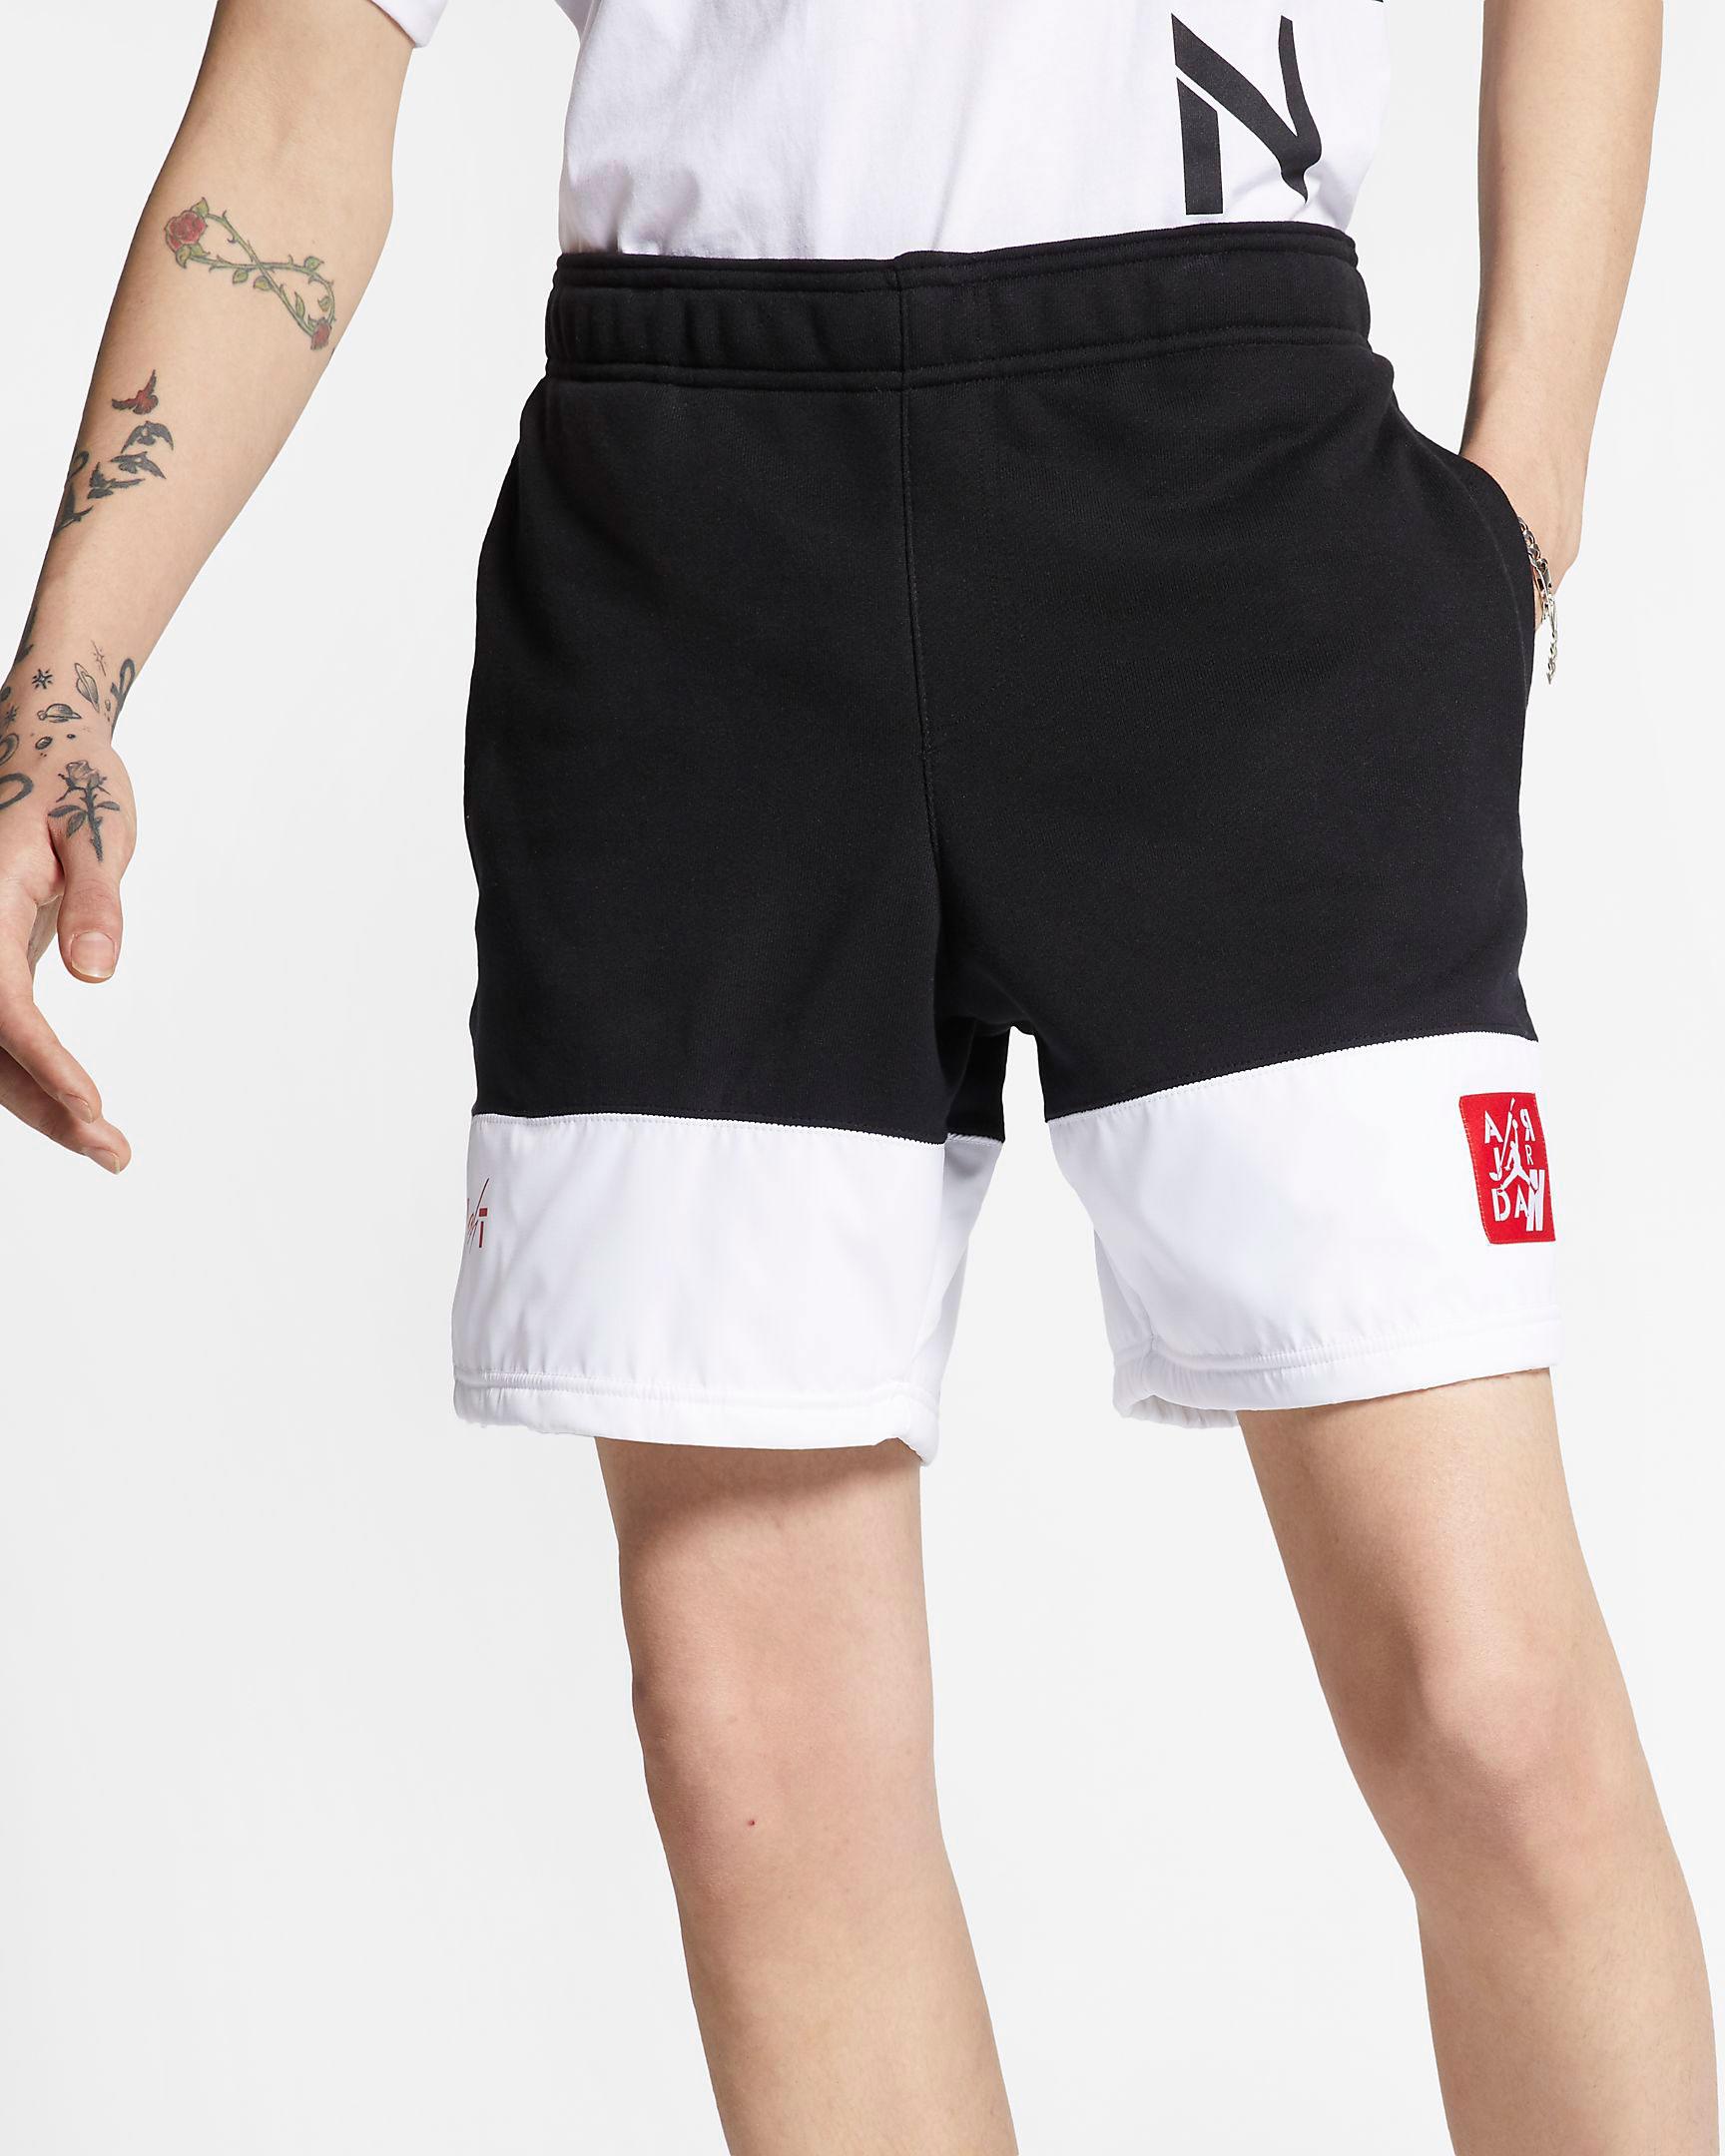 air-jordan-4-bred-2019-shorts-1